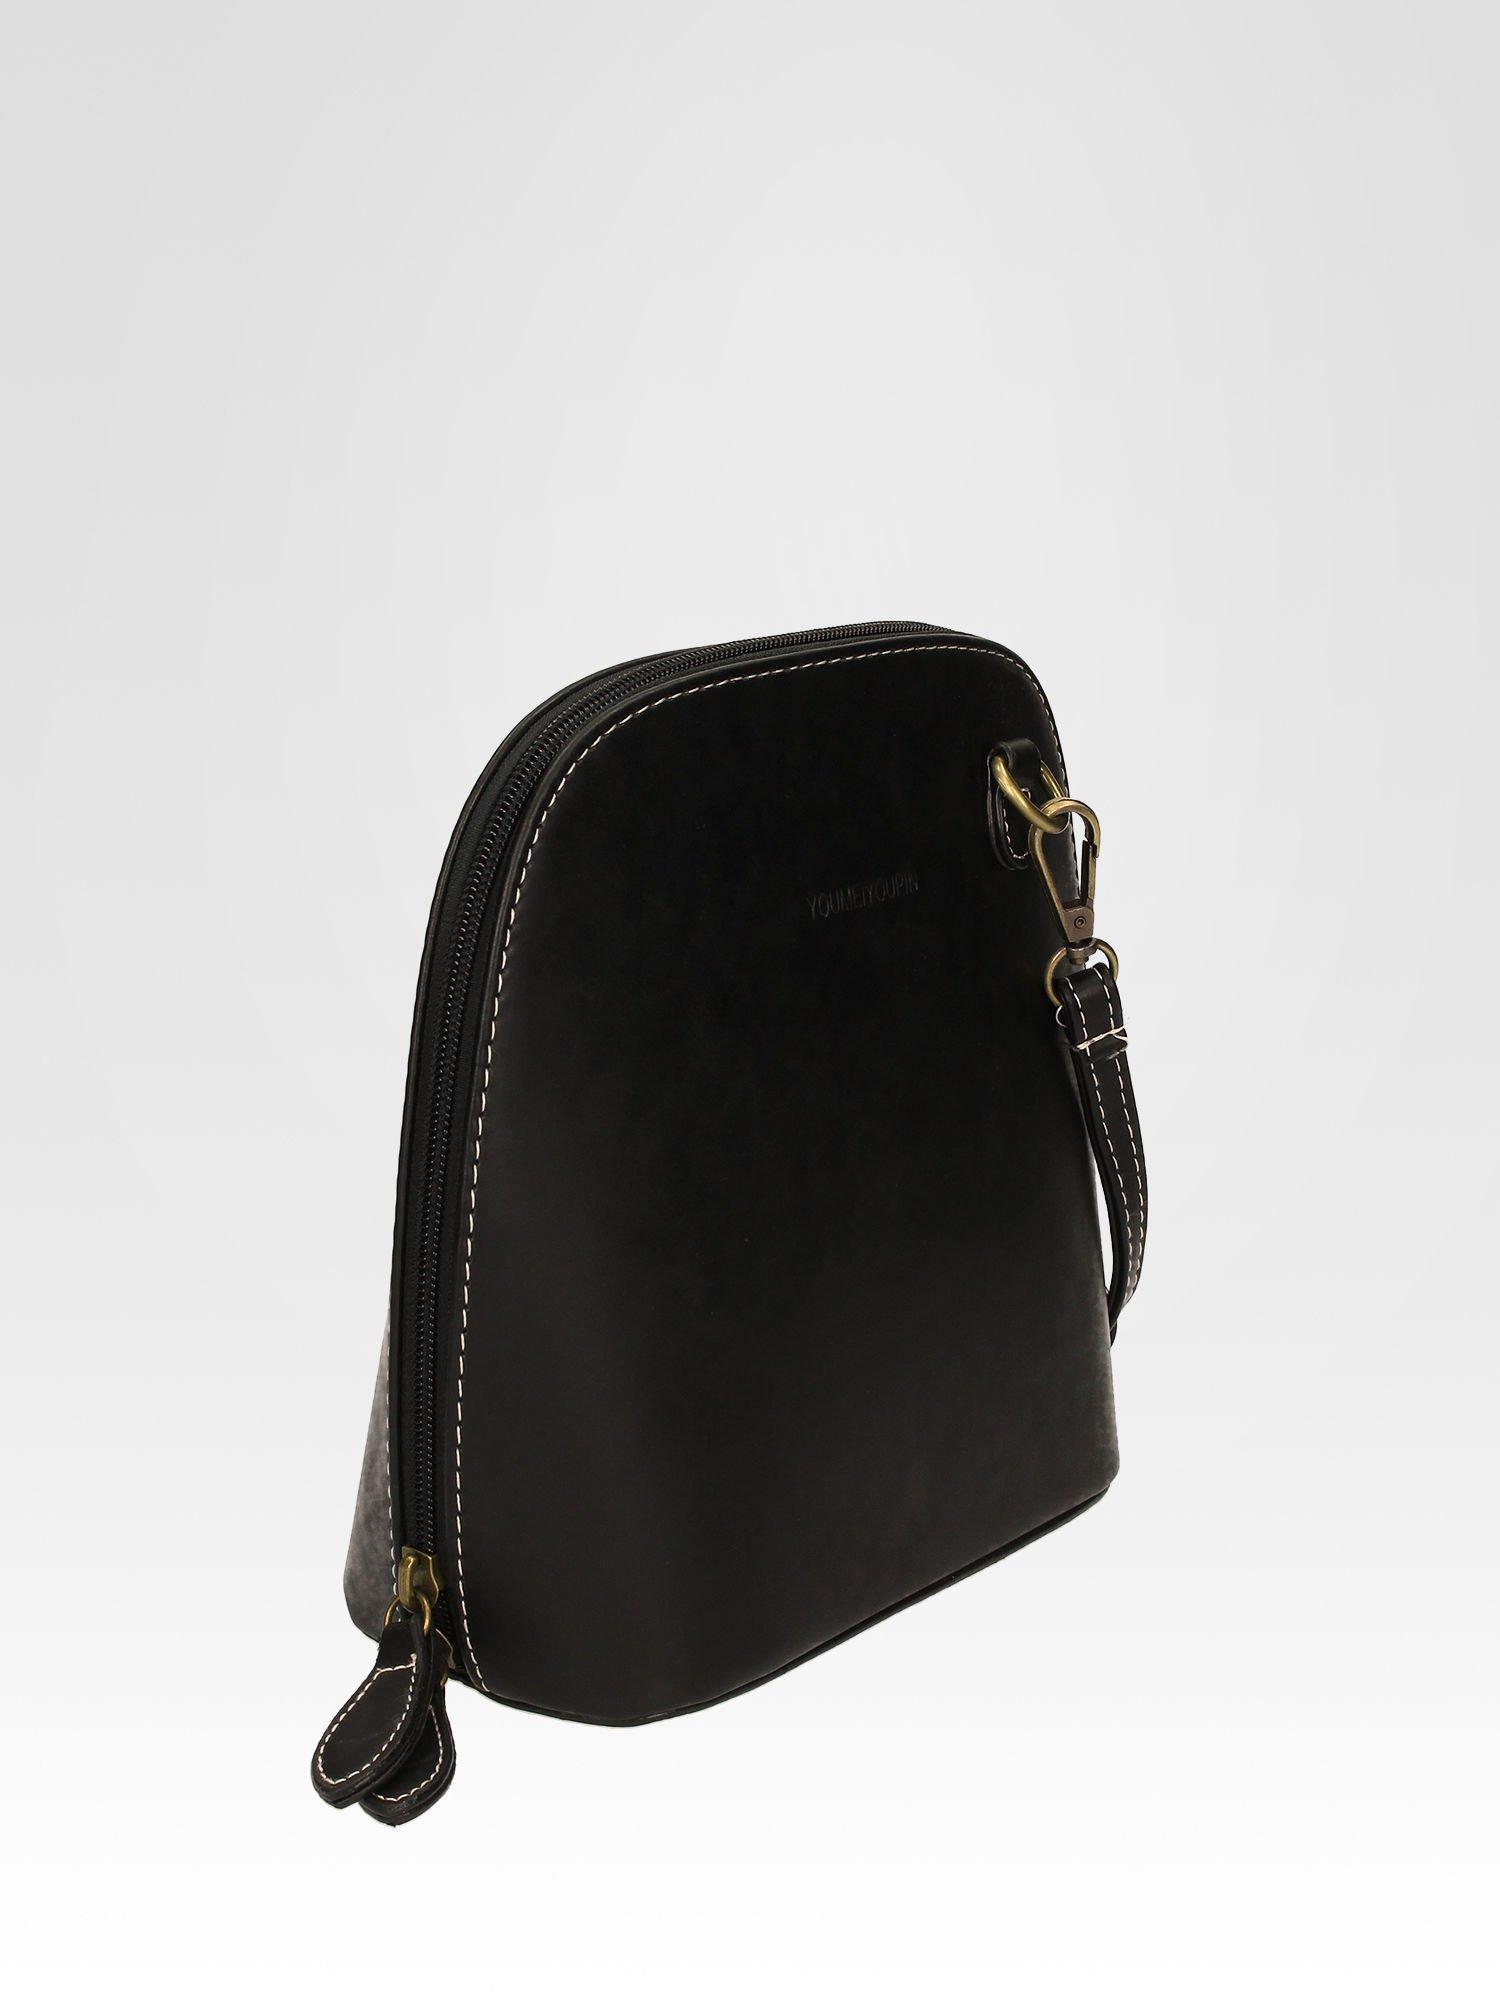 Czarna elegancka listonoszka z odpinanaym paskiem                                  zdj.                                  2